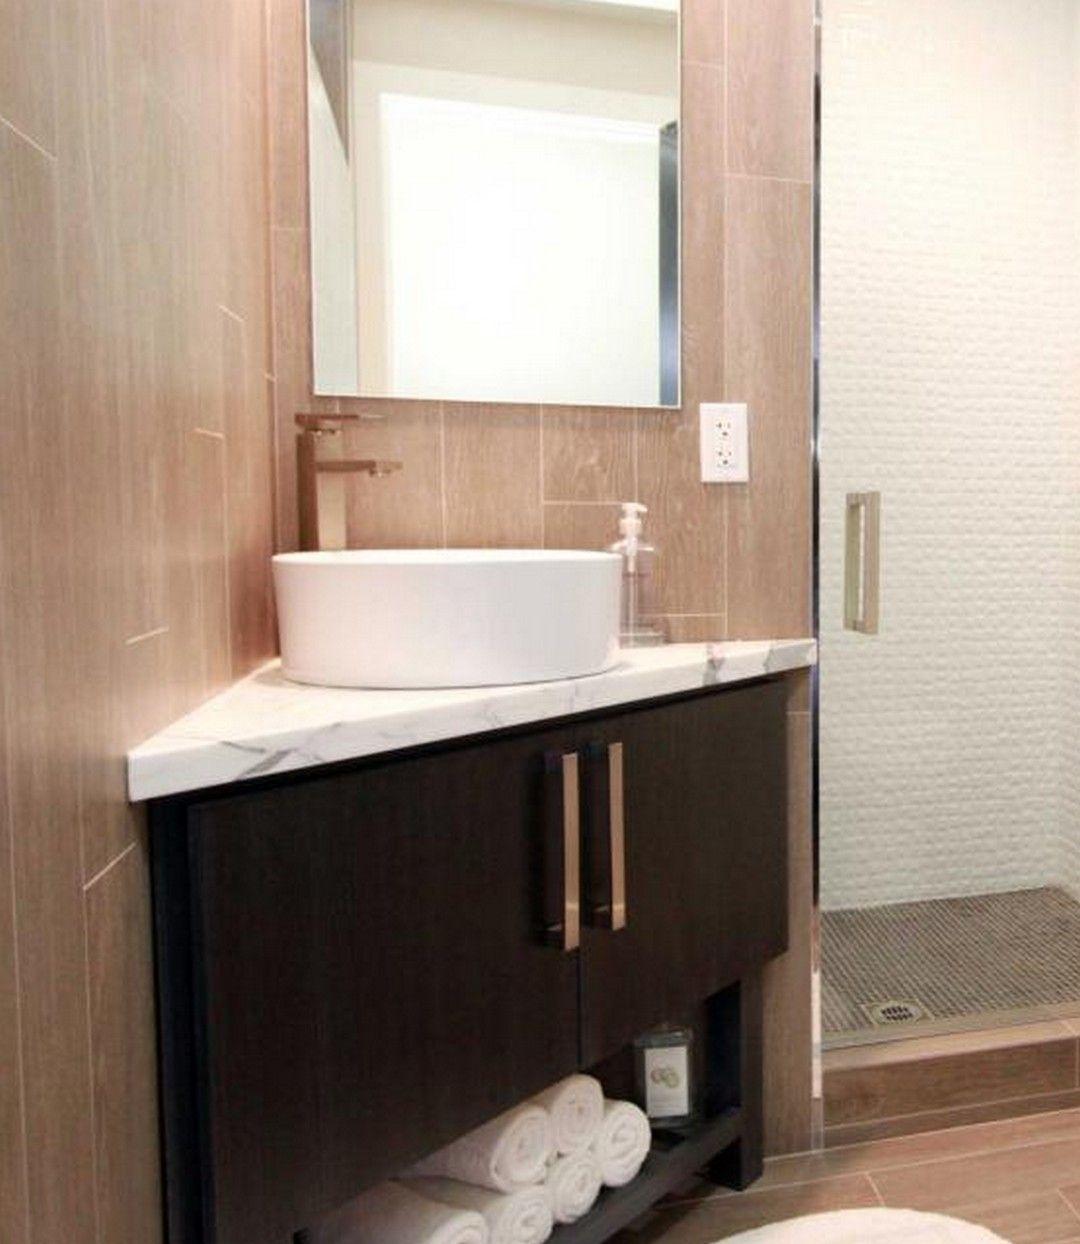 wonderful corner bathroom vanity | Pin από το χρήστη nanazax στον πίνακα Ιδέες για το μπάνιο ...